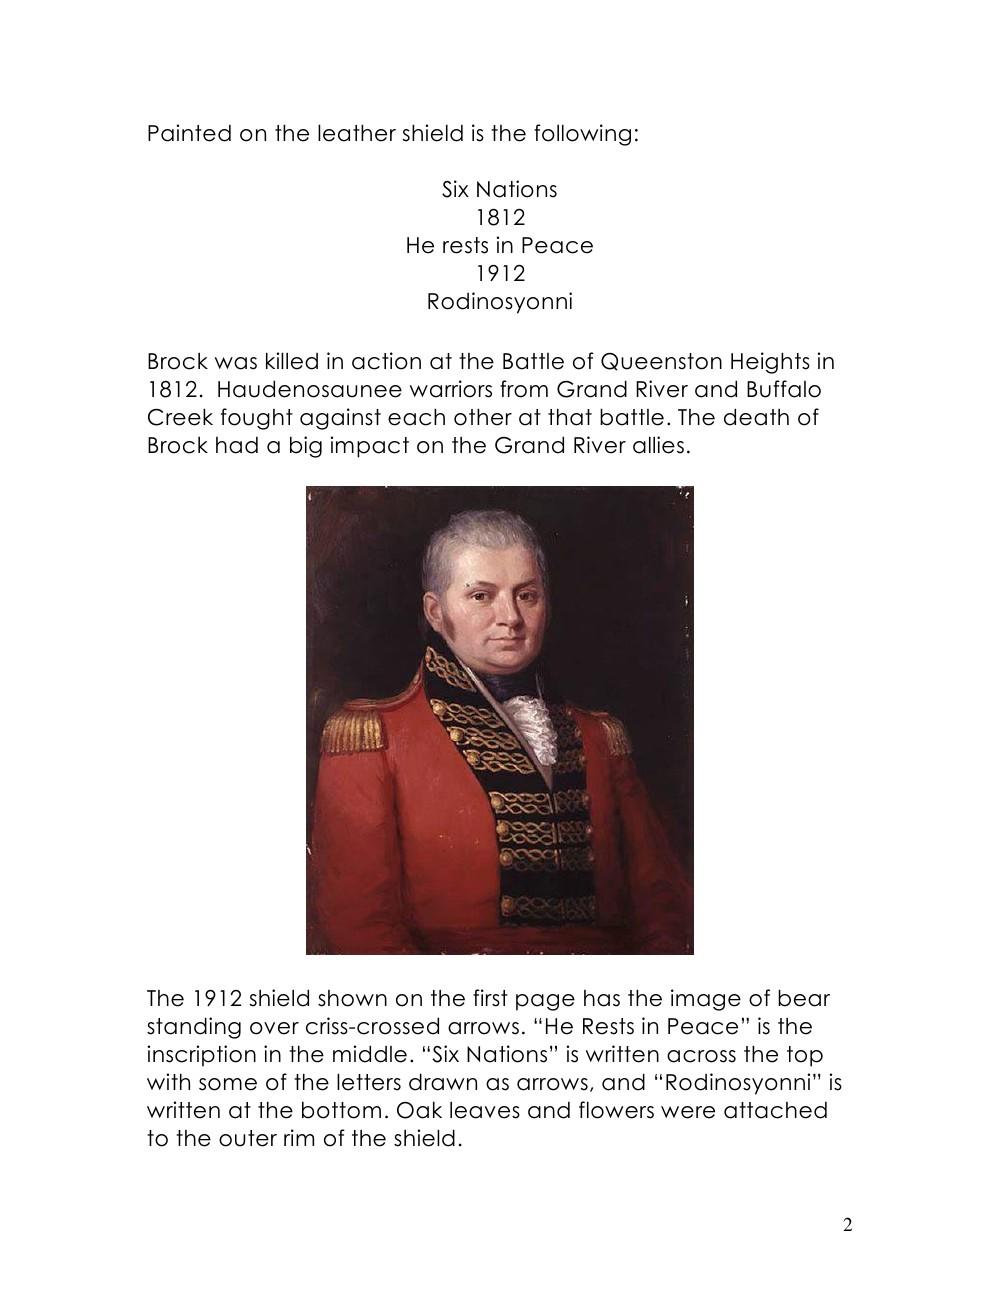 War of 1812 Series : Haudenosaunee and the War of 1812 - Six Nations and Isaac Brock